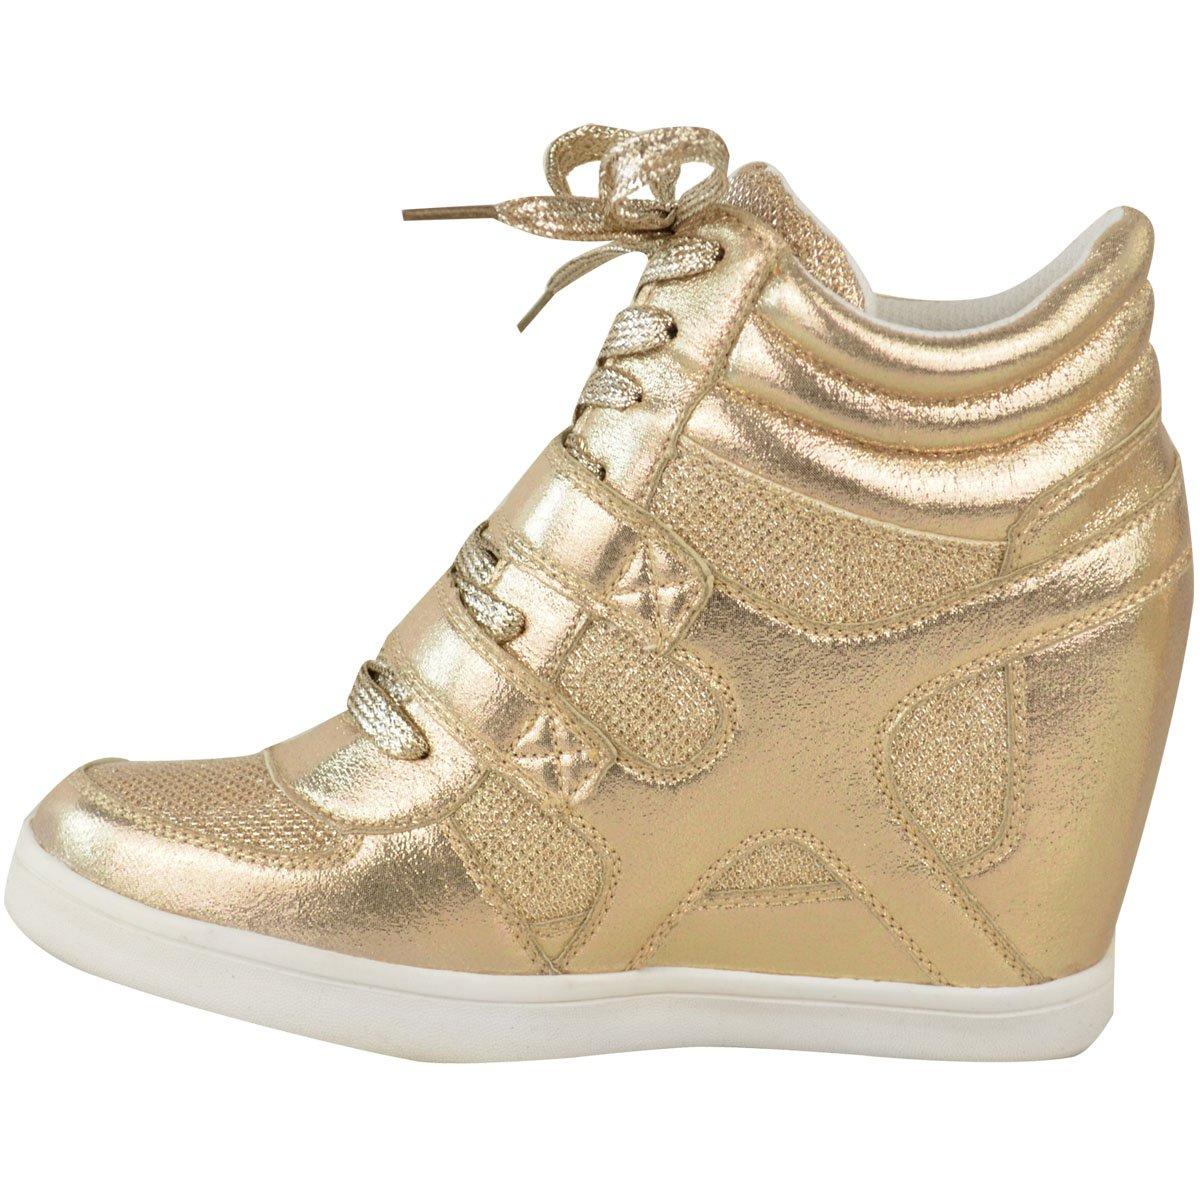 Sneaker Keilabsatz Wedges Klettverschluss Damen Schuhe Sportschuhe Goldfarbe